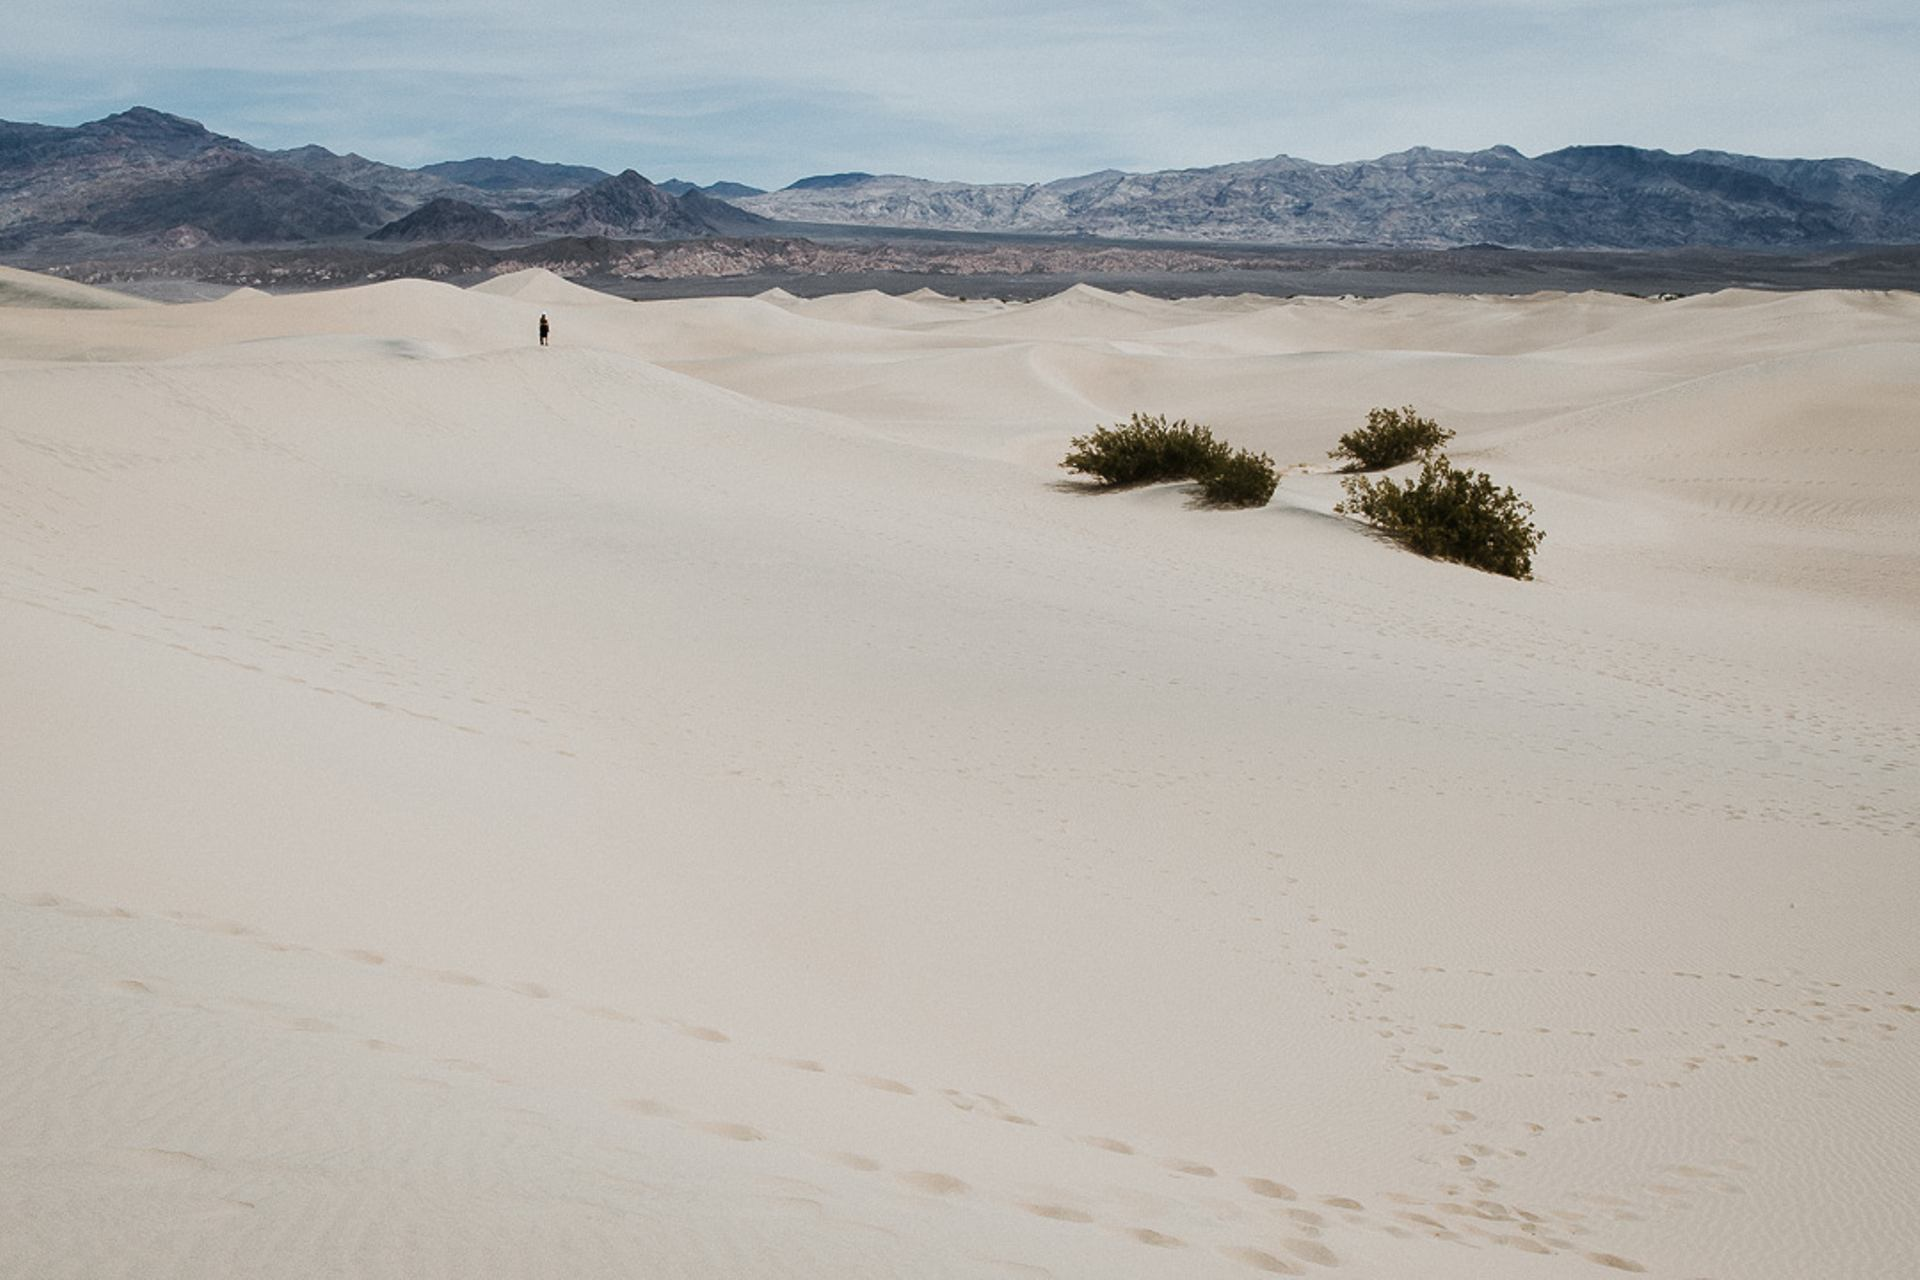 miliedel-photographer-california-deathvalley-sand-dunes.jpg